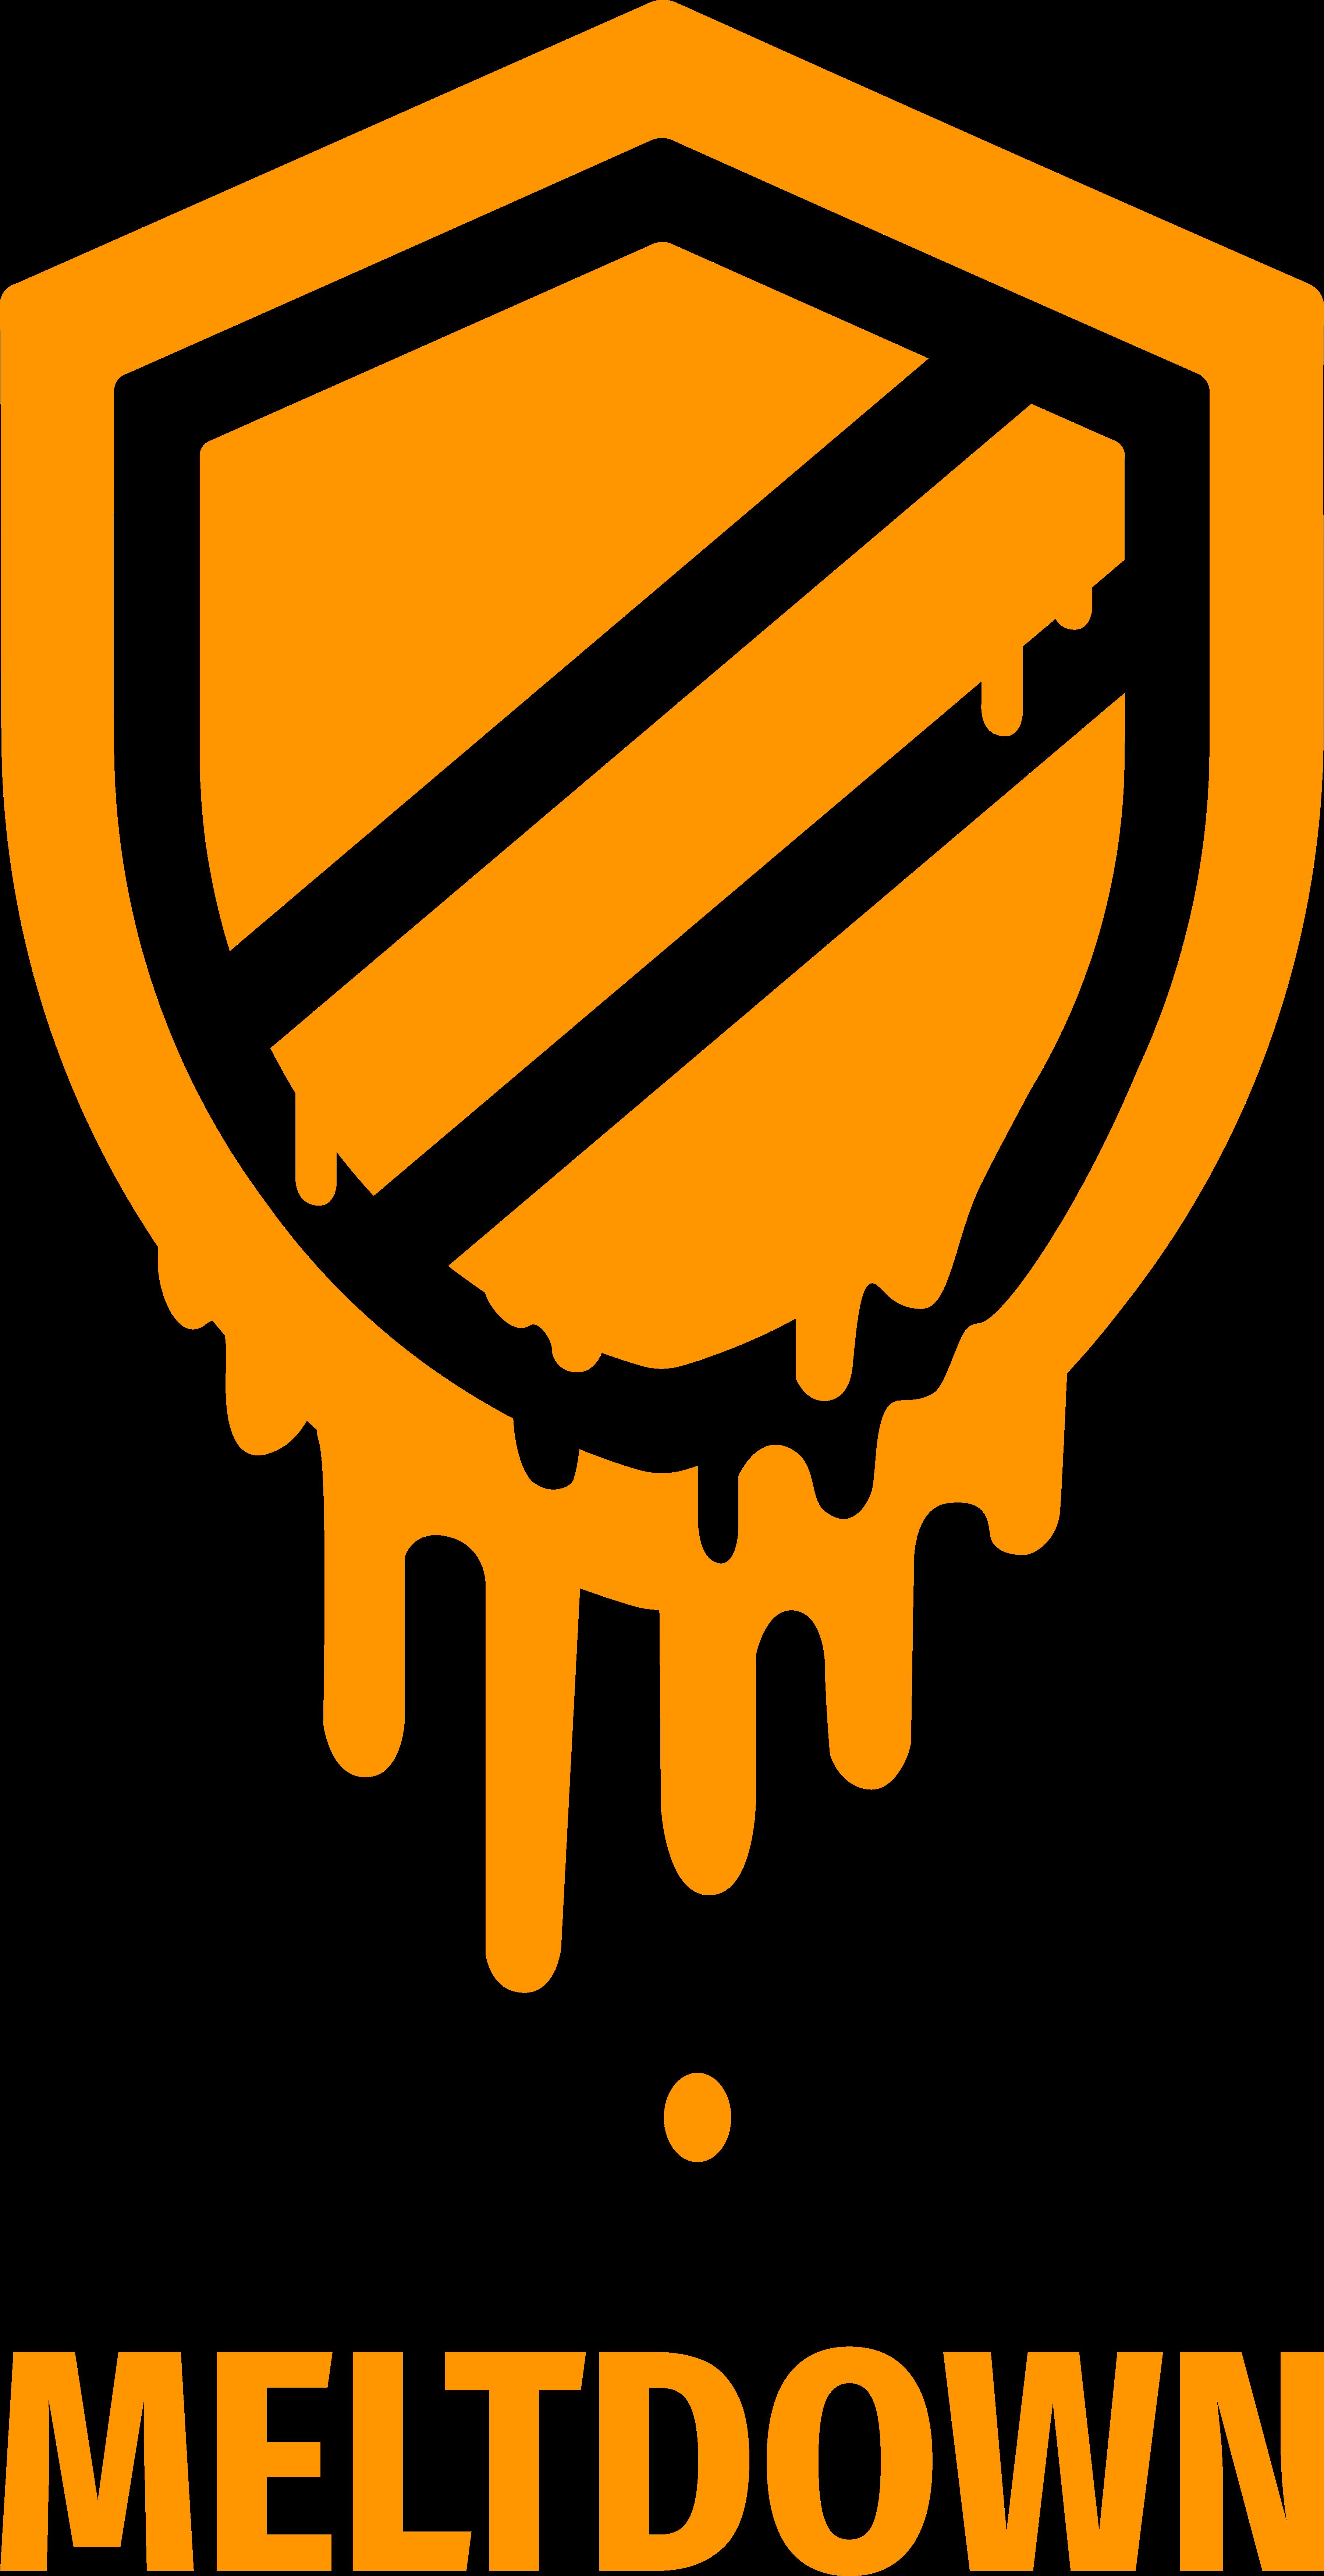 Meltdown logo, free to use under CC0 (see https://meltdownattack.com/ for details).